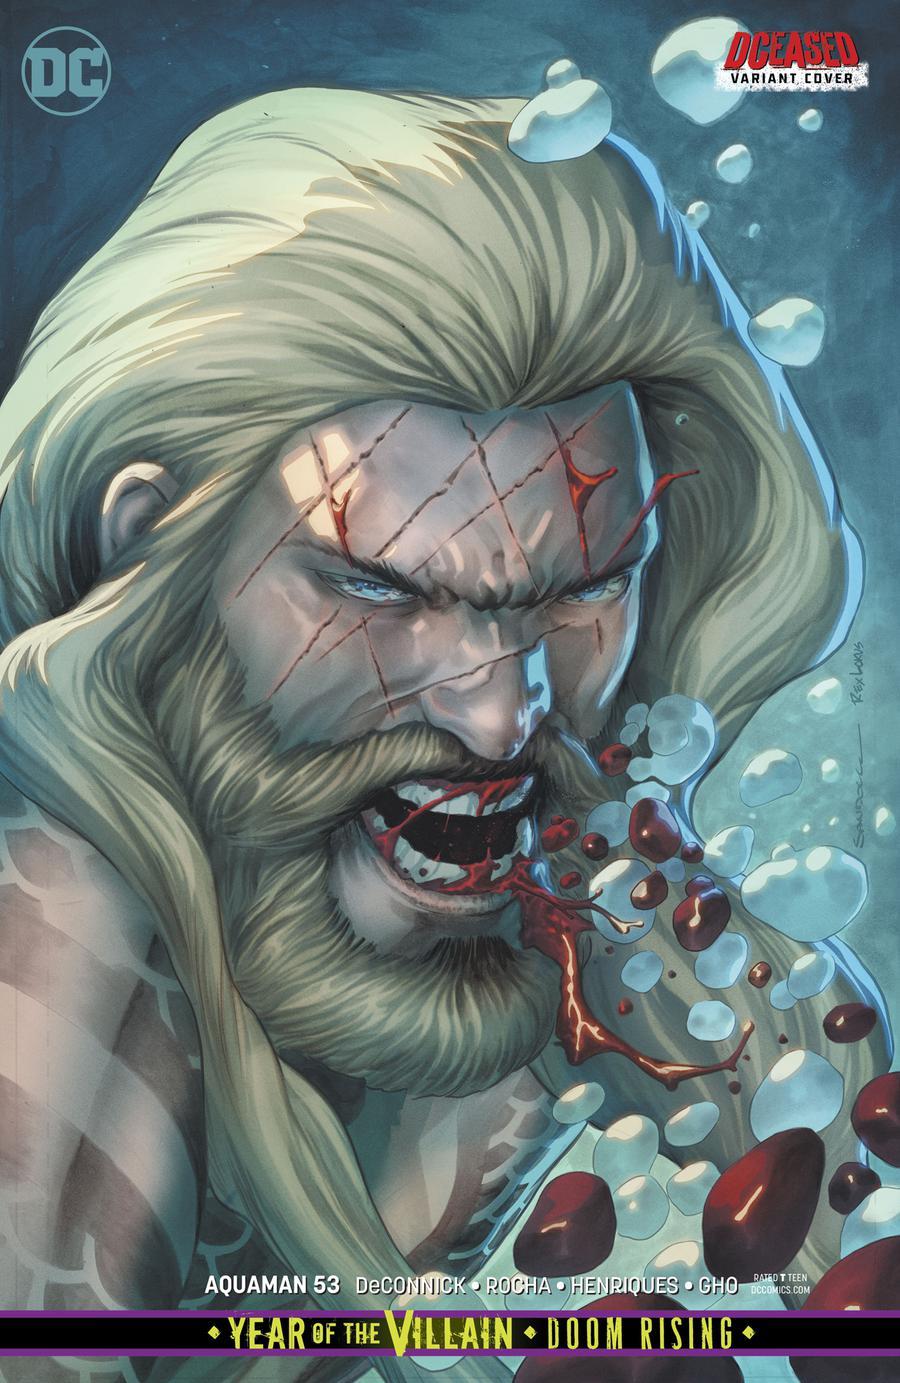 Aquaman Vol 6 #53 Cover B Variant Rafa Sandoval DCeased Cover (Year Of The Villain Doom Rising Tie-In)